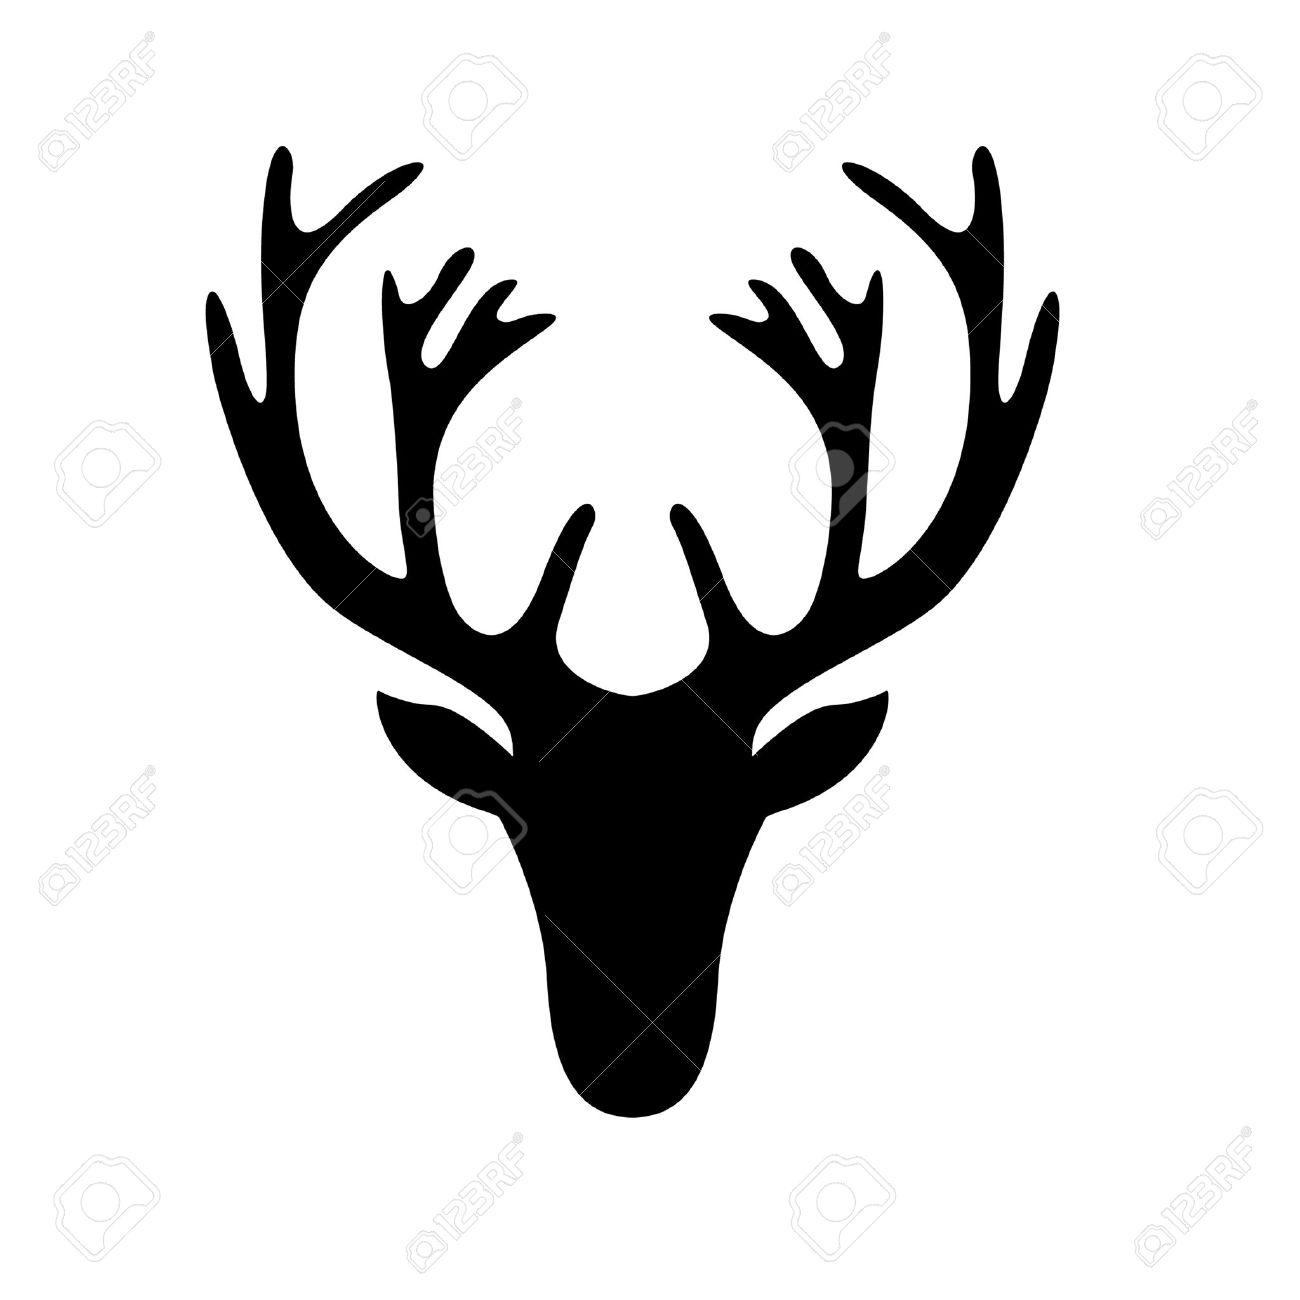 Fantastic A Deer Head Silhouette Isolated On Royalty Deer Head Silhouette Flowers Deer Head Silhouette Illustration A Deer Head Silhouette Isolated On Stock Vector Illustration Cricut houzz-03 Deer Head Silhouette